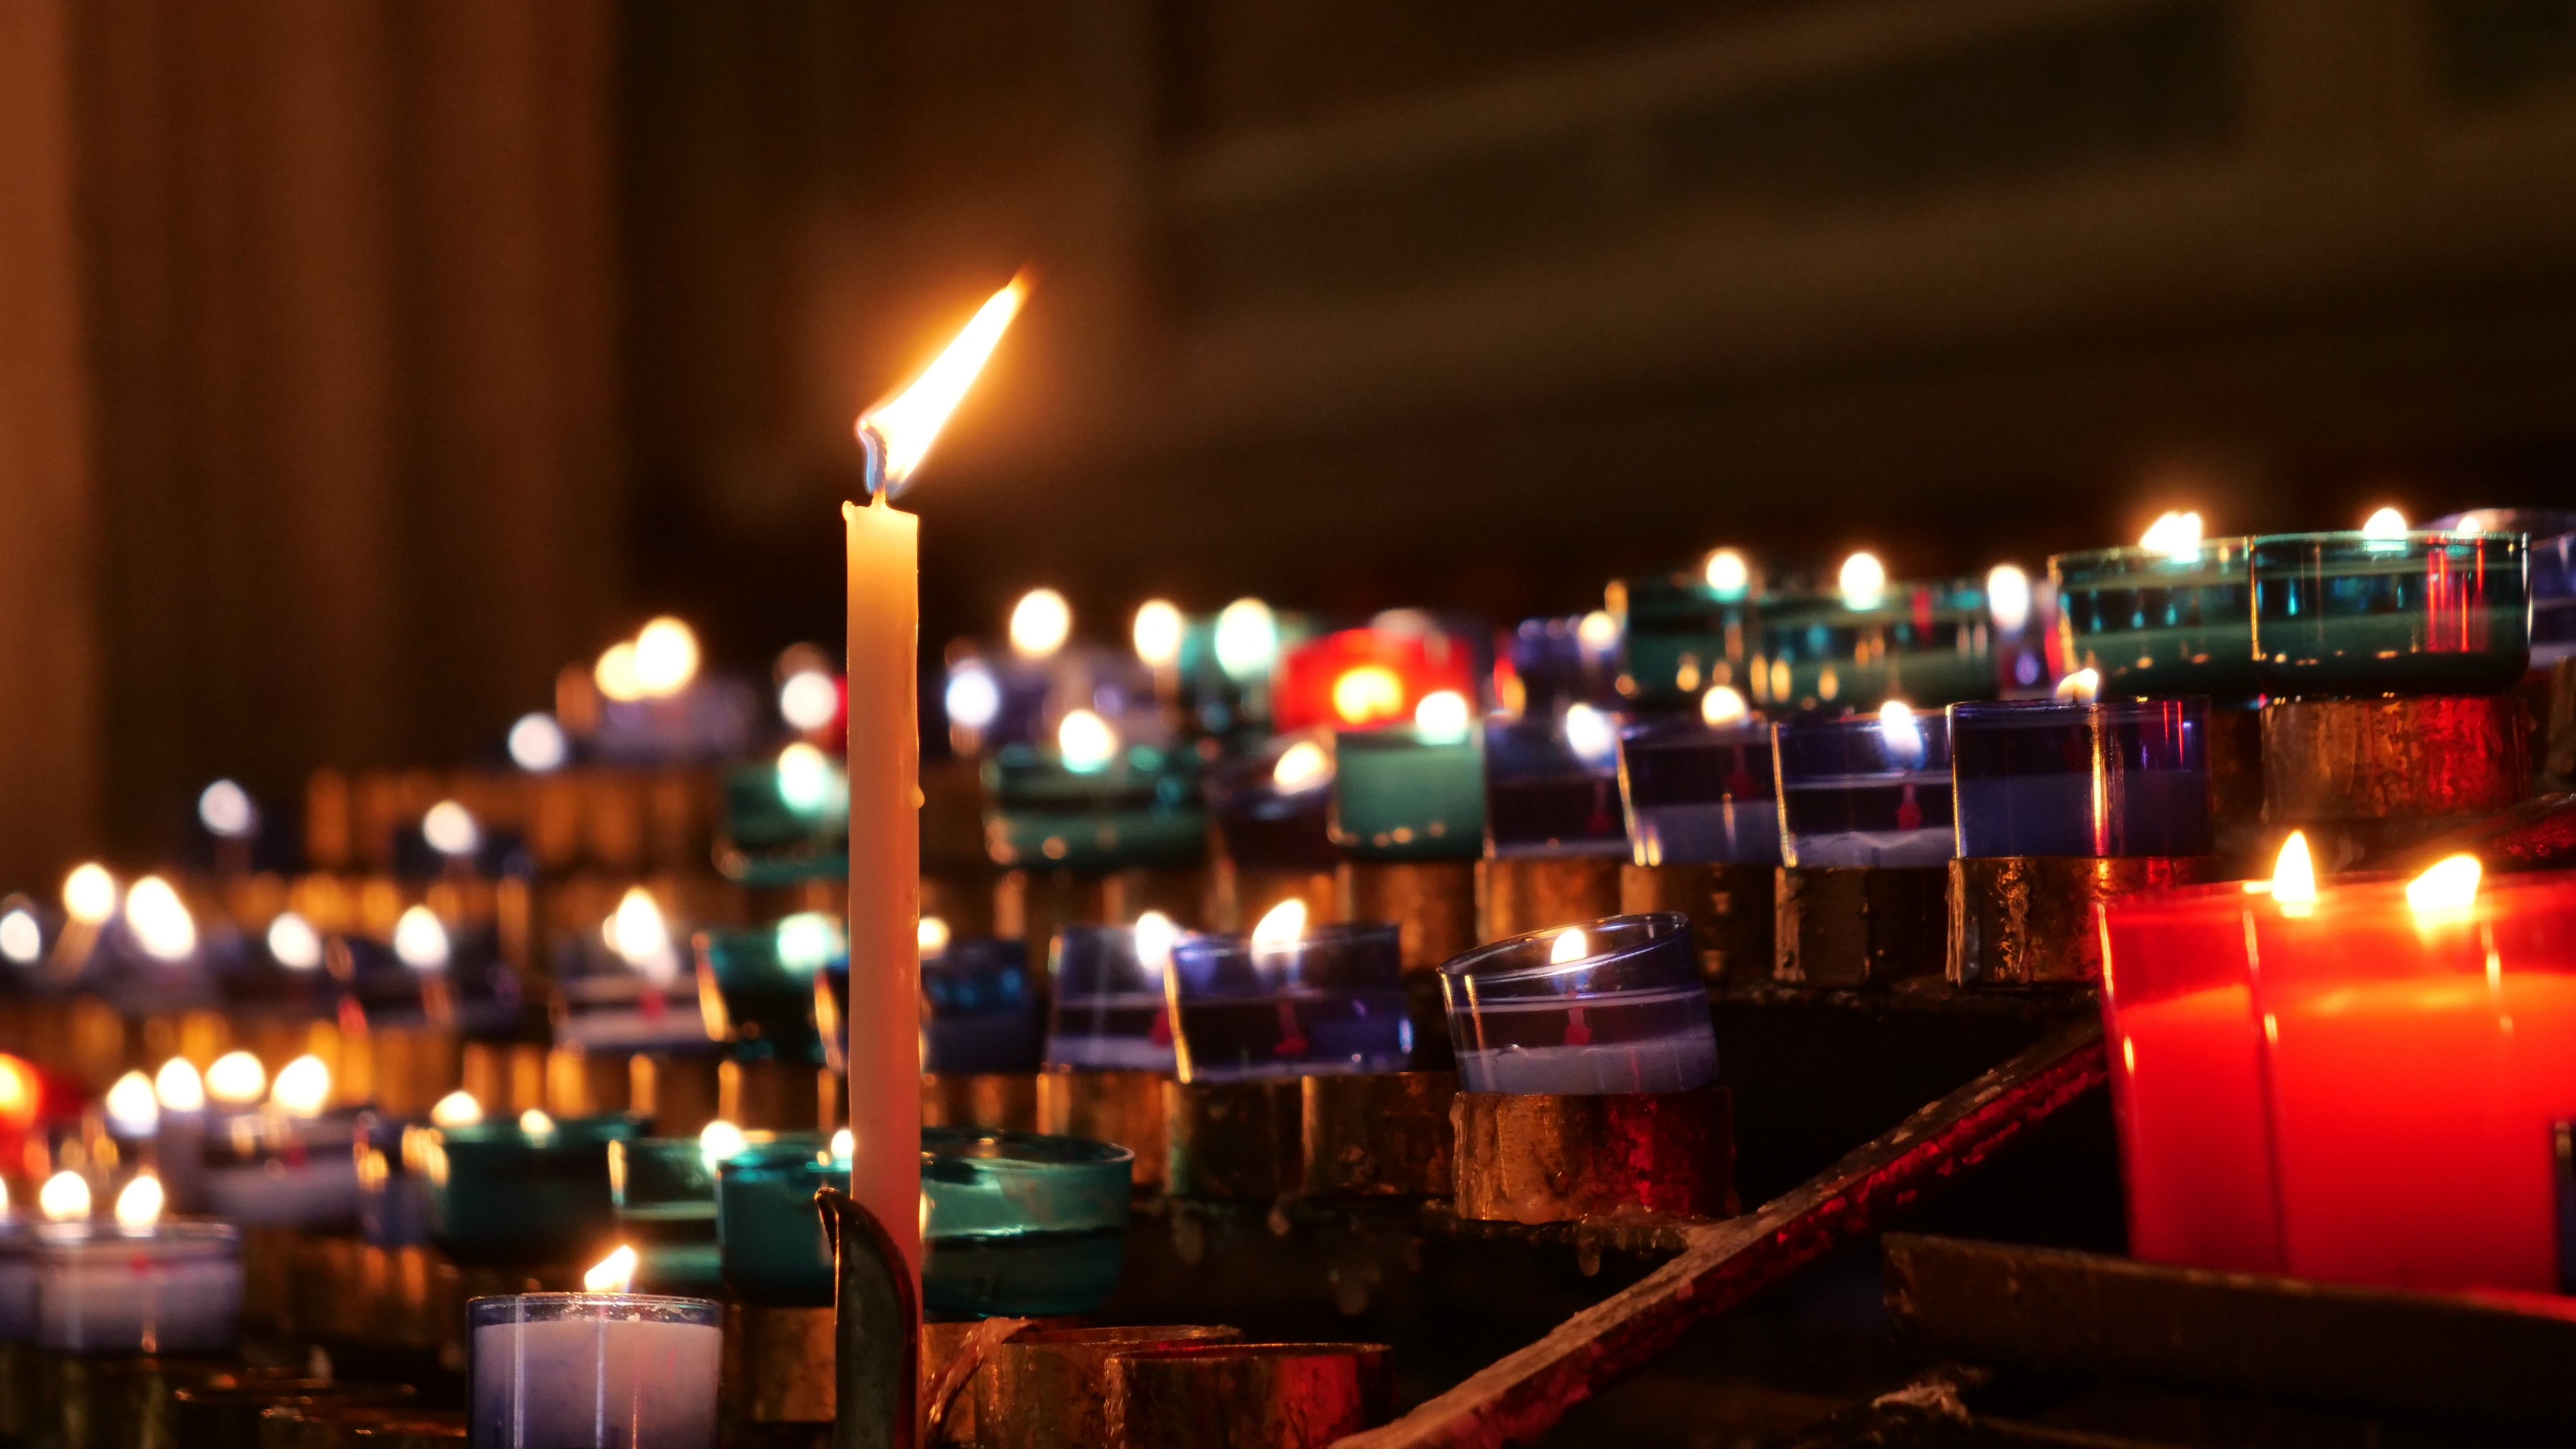 General 5084x2860 candles church lights spiritual